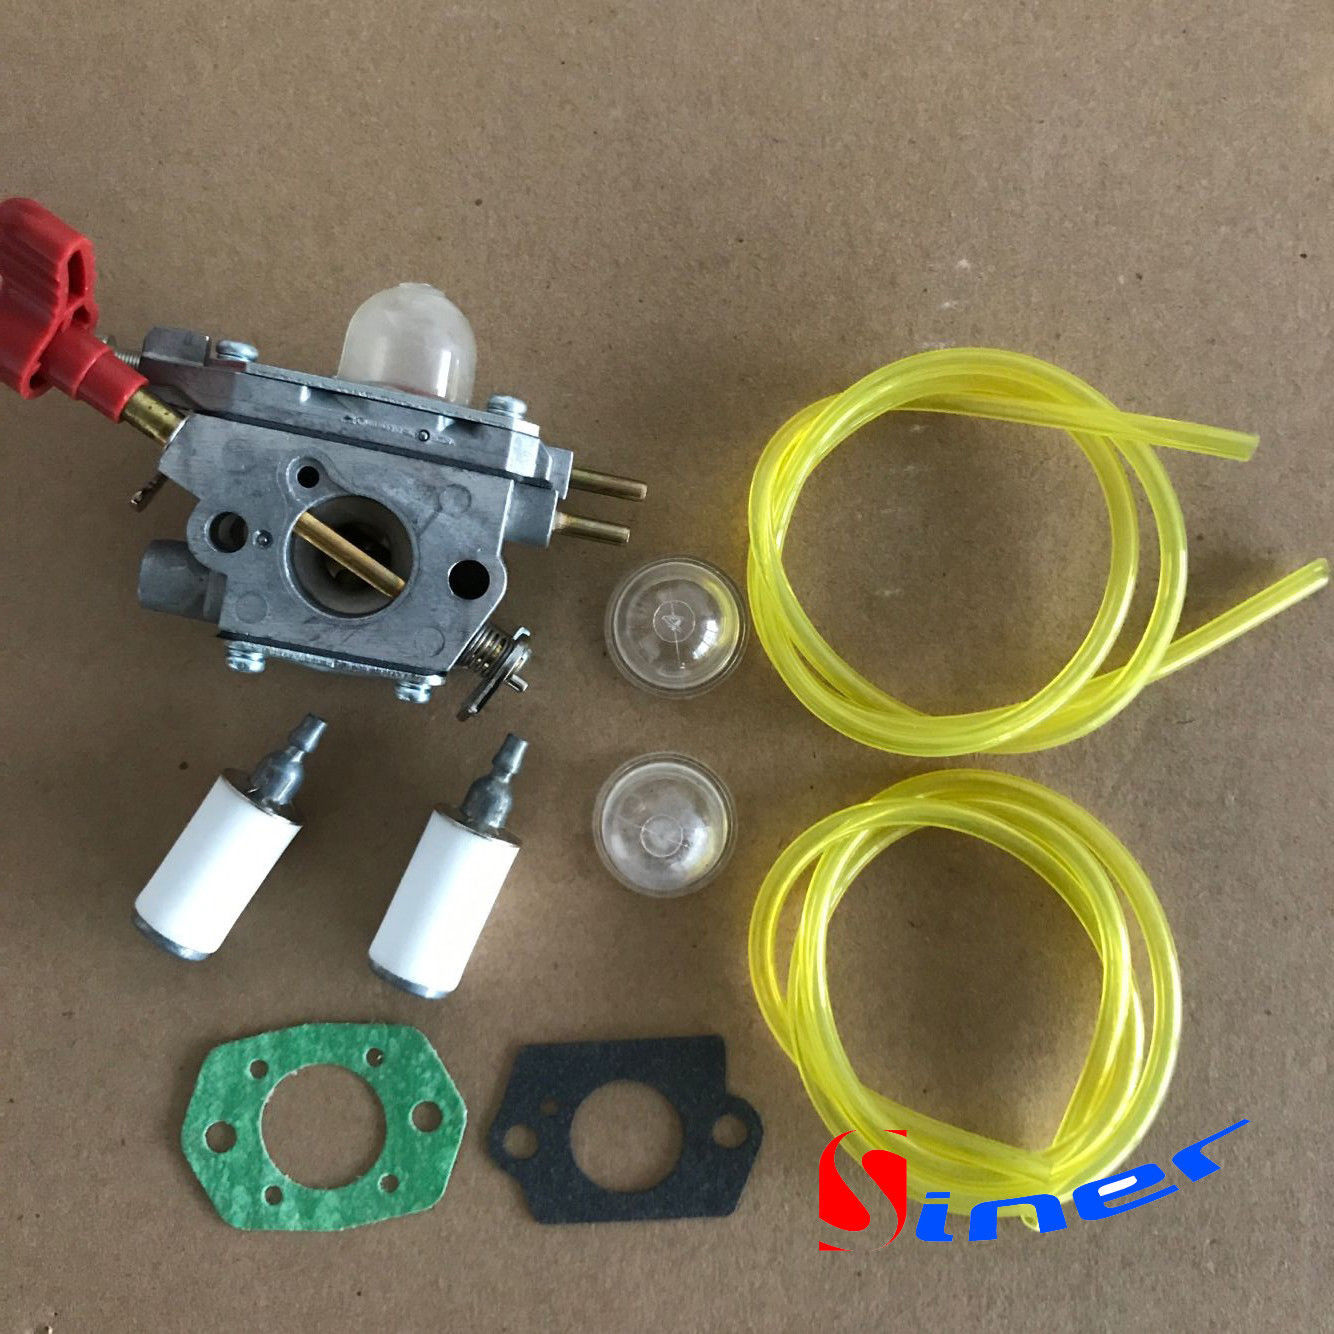 Carburetor Fuel Line Filter  MTD 753-06288 ZAMA C1U-P27 TB2044XP Carb Craftsman for sale  USA